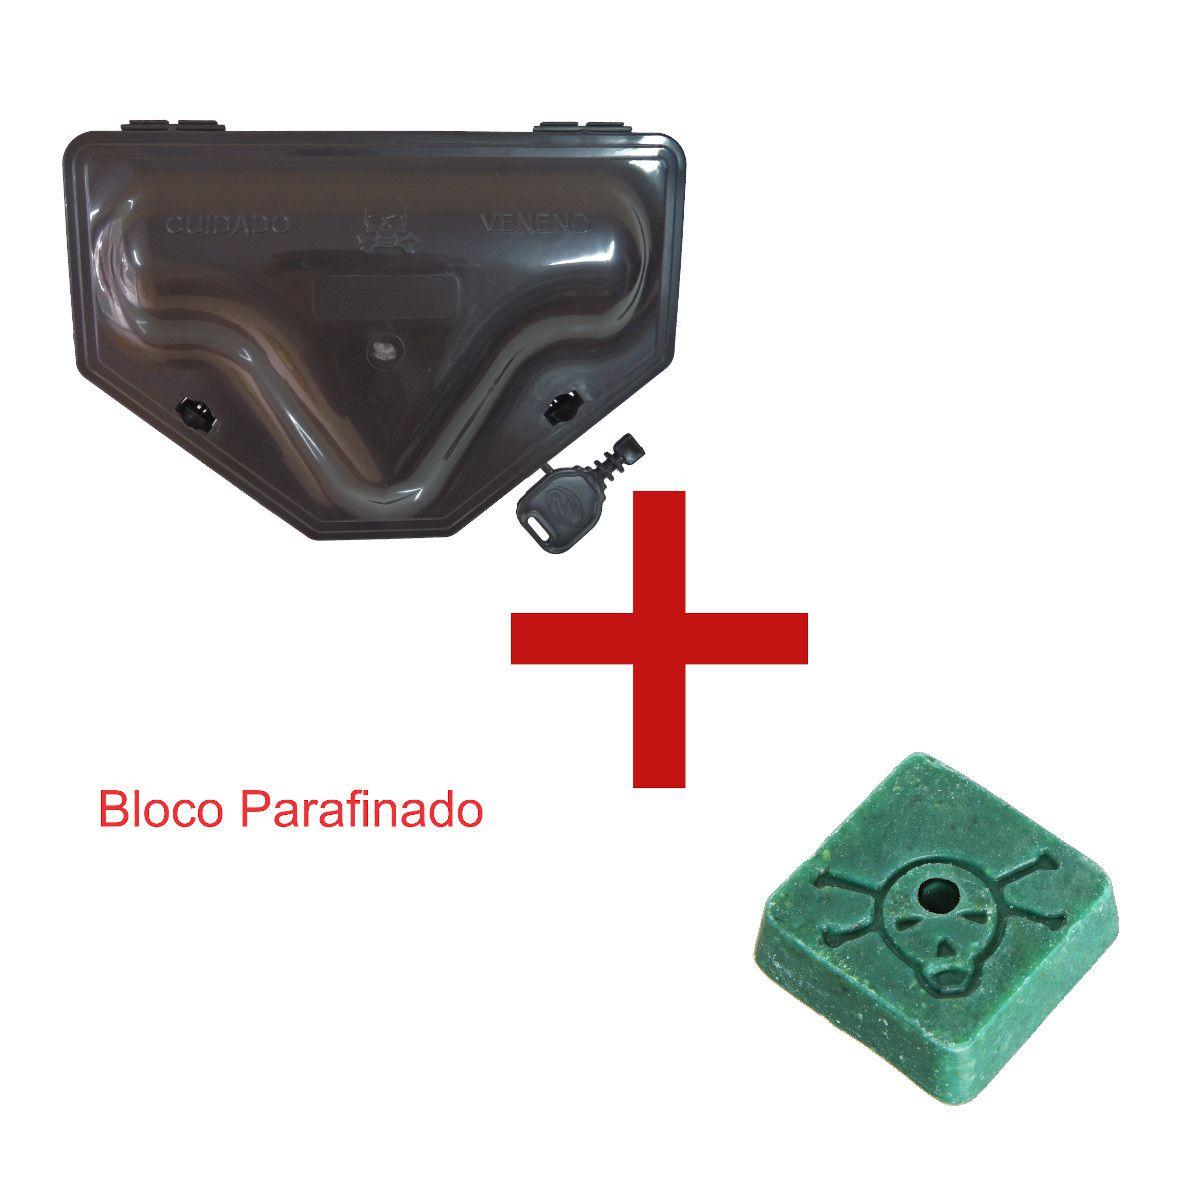 KIT 65 Porta Iscas Reforçado 2 TRAVAS Chave Ratoeira p/Ratos